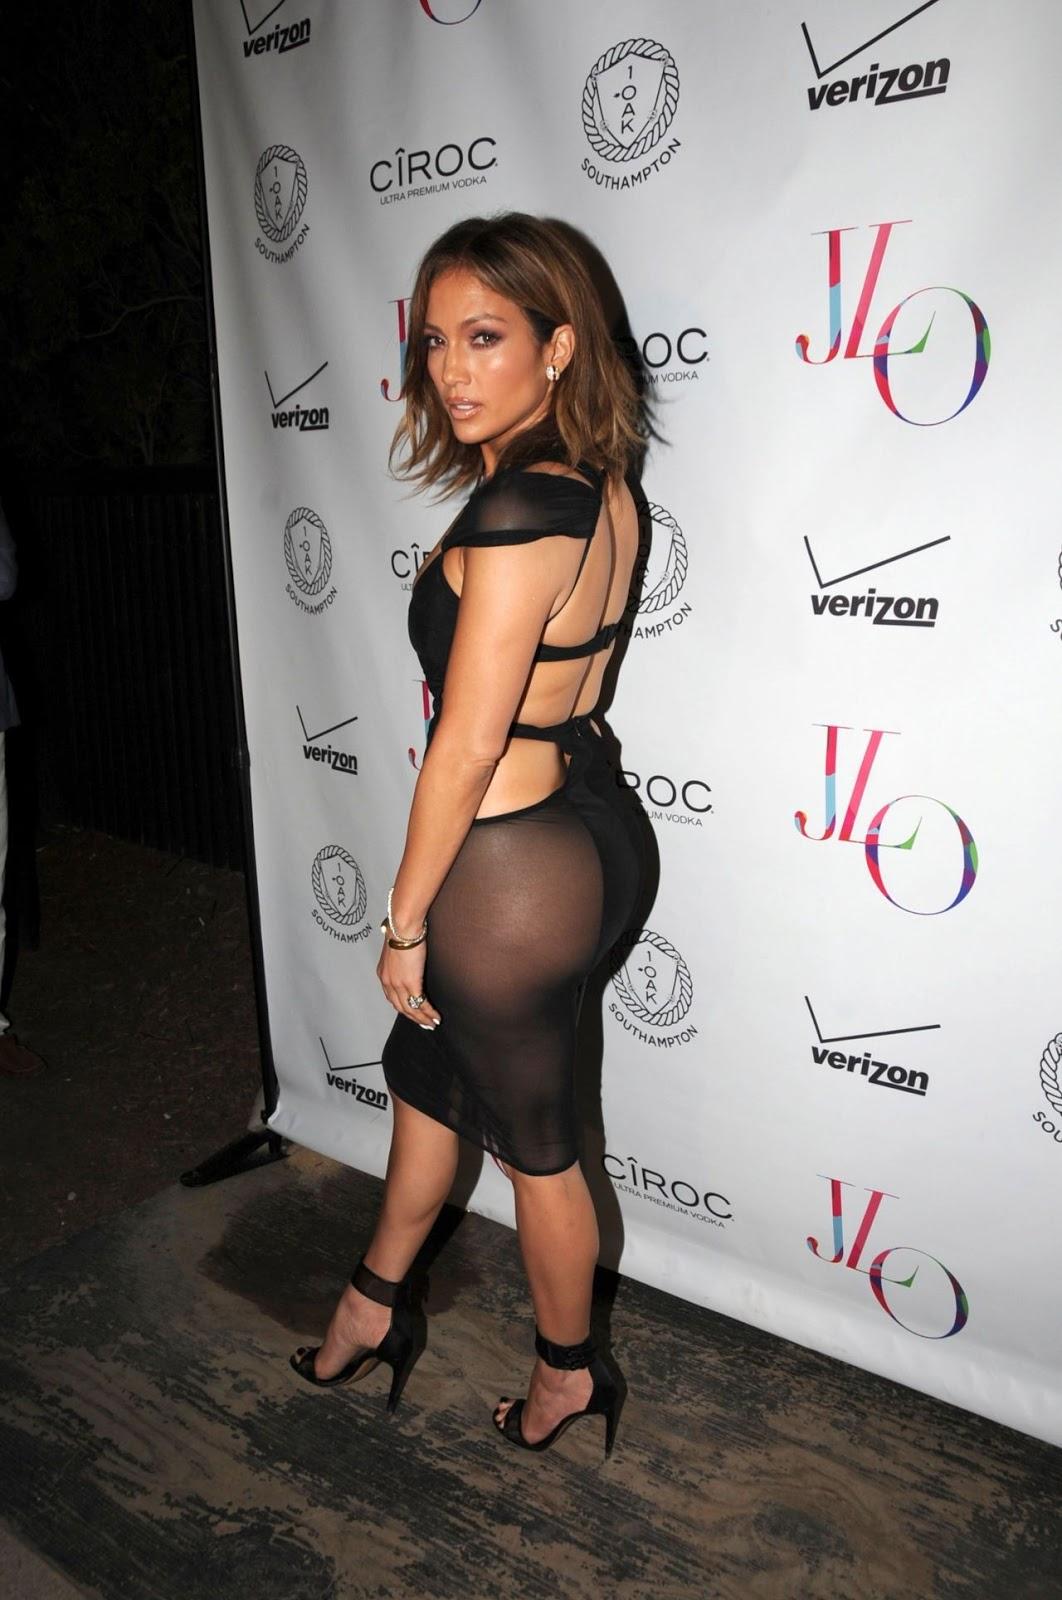 Jennifer Lopez flaunts derrière in sheer dress for 46th Birthday Celebrations